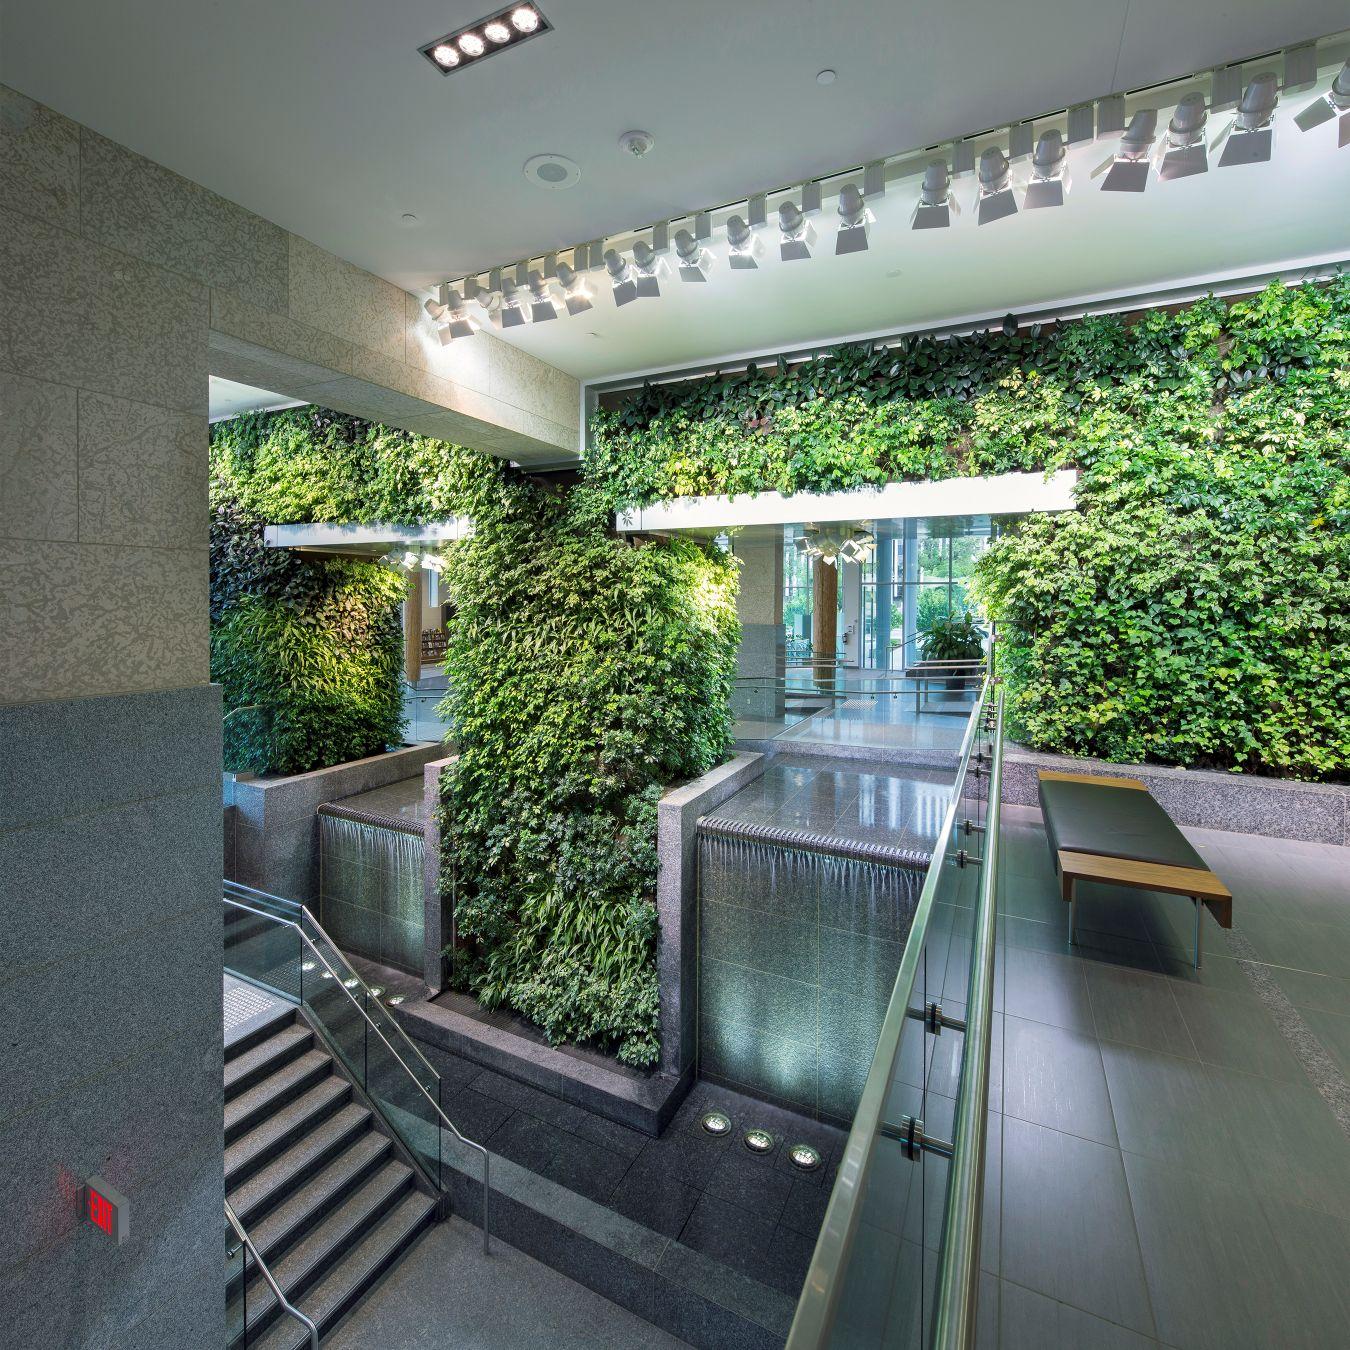 Edmonton Federal Building Living Wall Biofilter